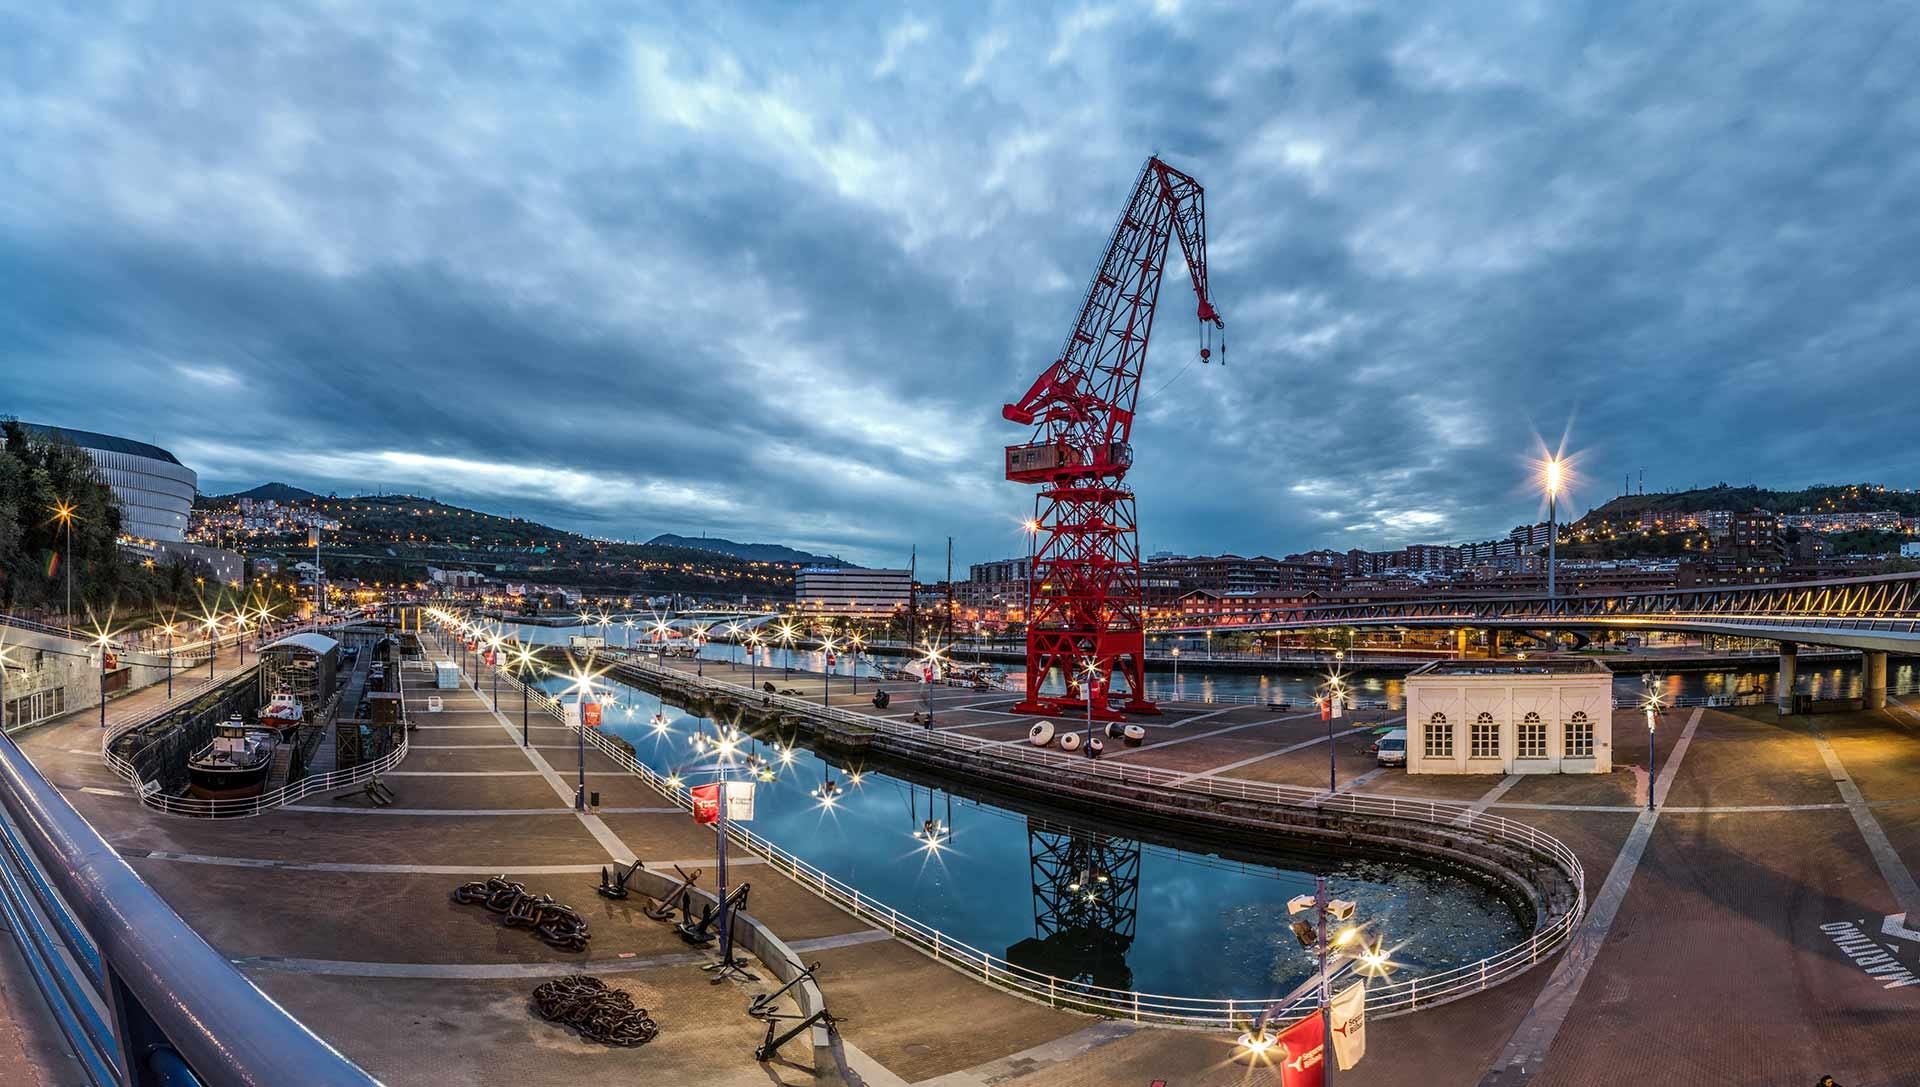 SEDE 2019, Itsasmuseum Bilbao